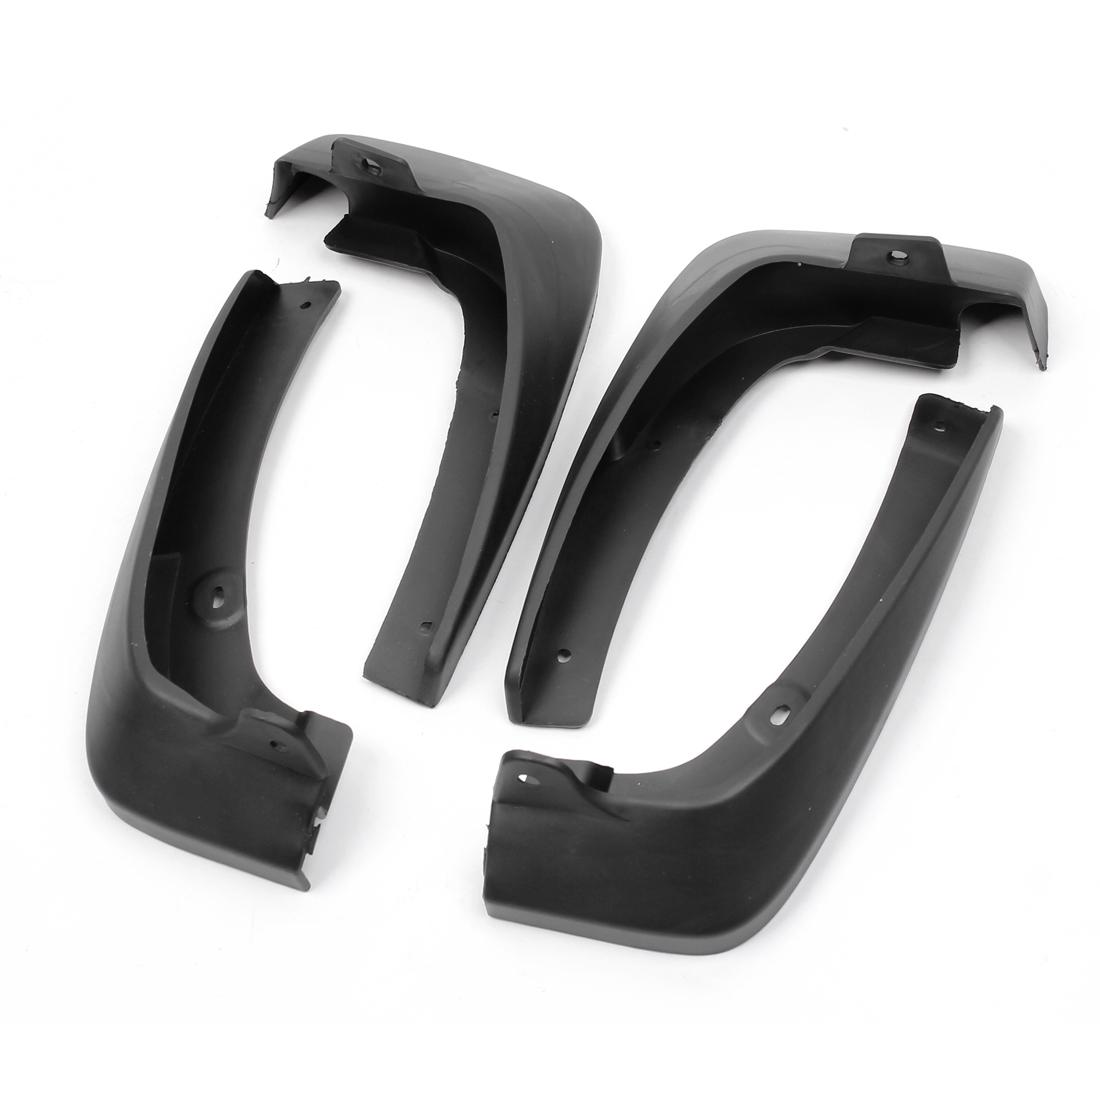 4pcs Auto Shield Splash Guards Mud Flap Front Rear Set for Toyota Vios 2008